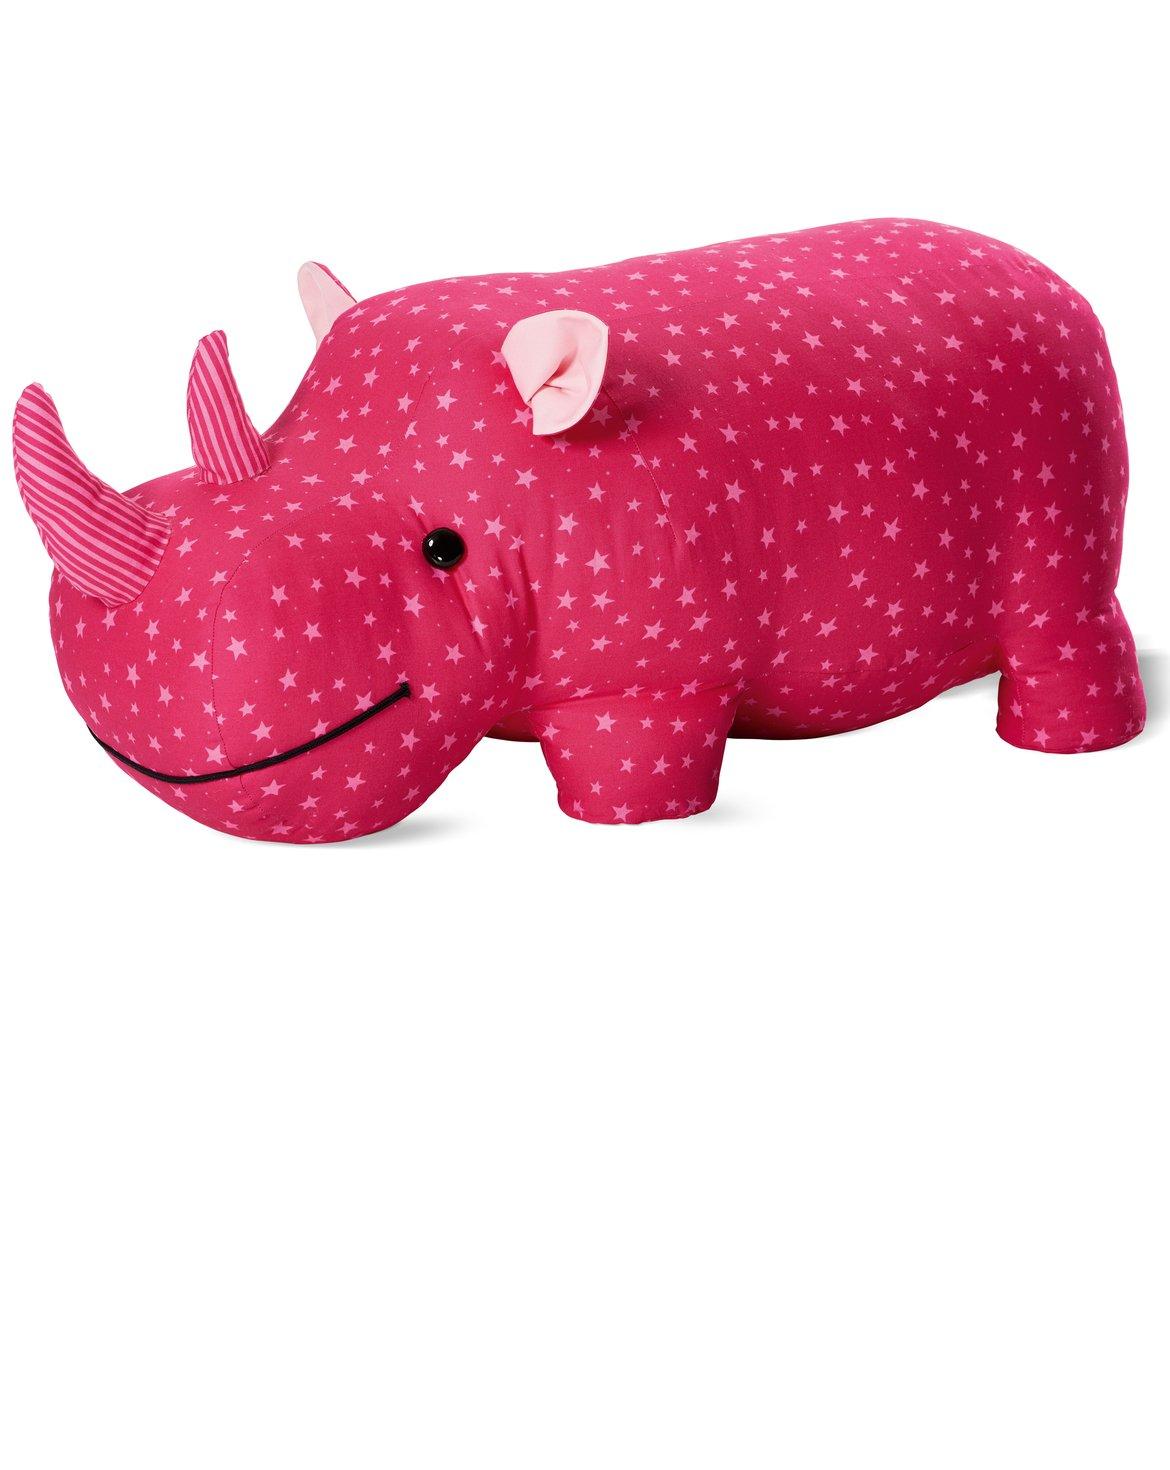 Sewing Level Burda Rhinoceros 6560 2 Pattern LeggeroAmazon fY6yv7gb